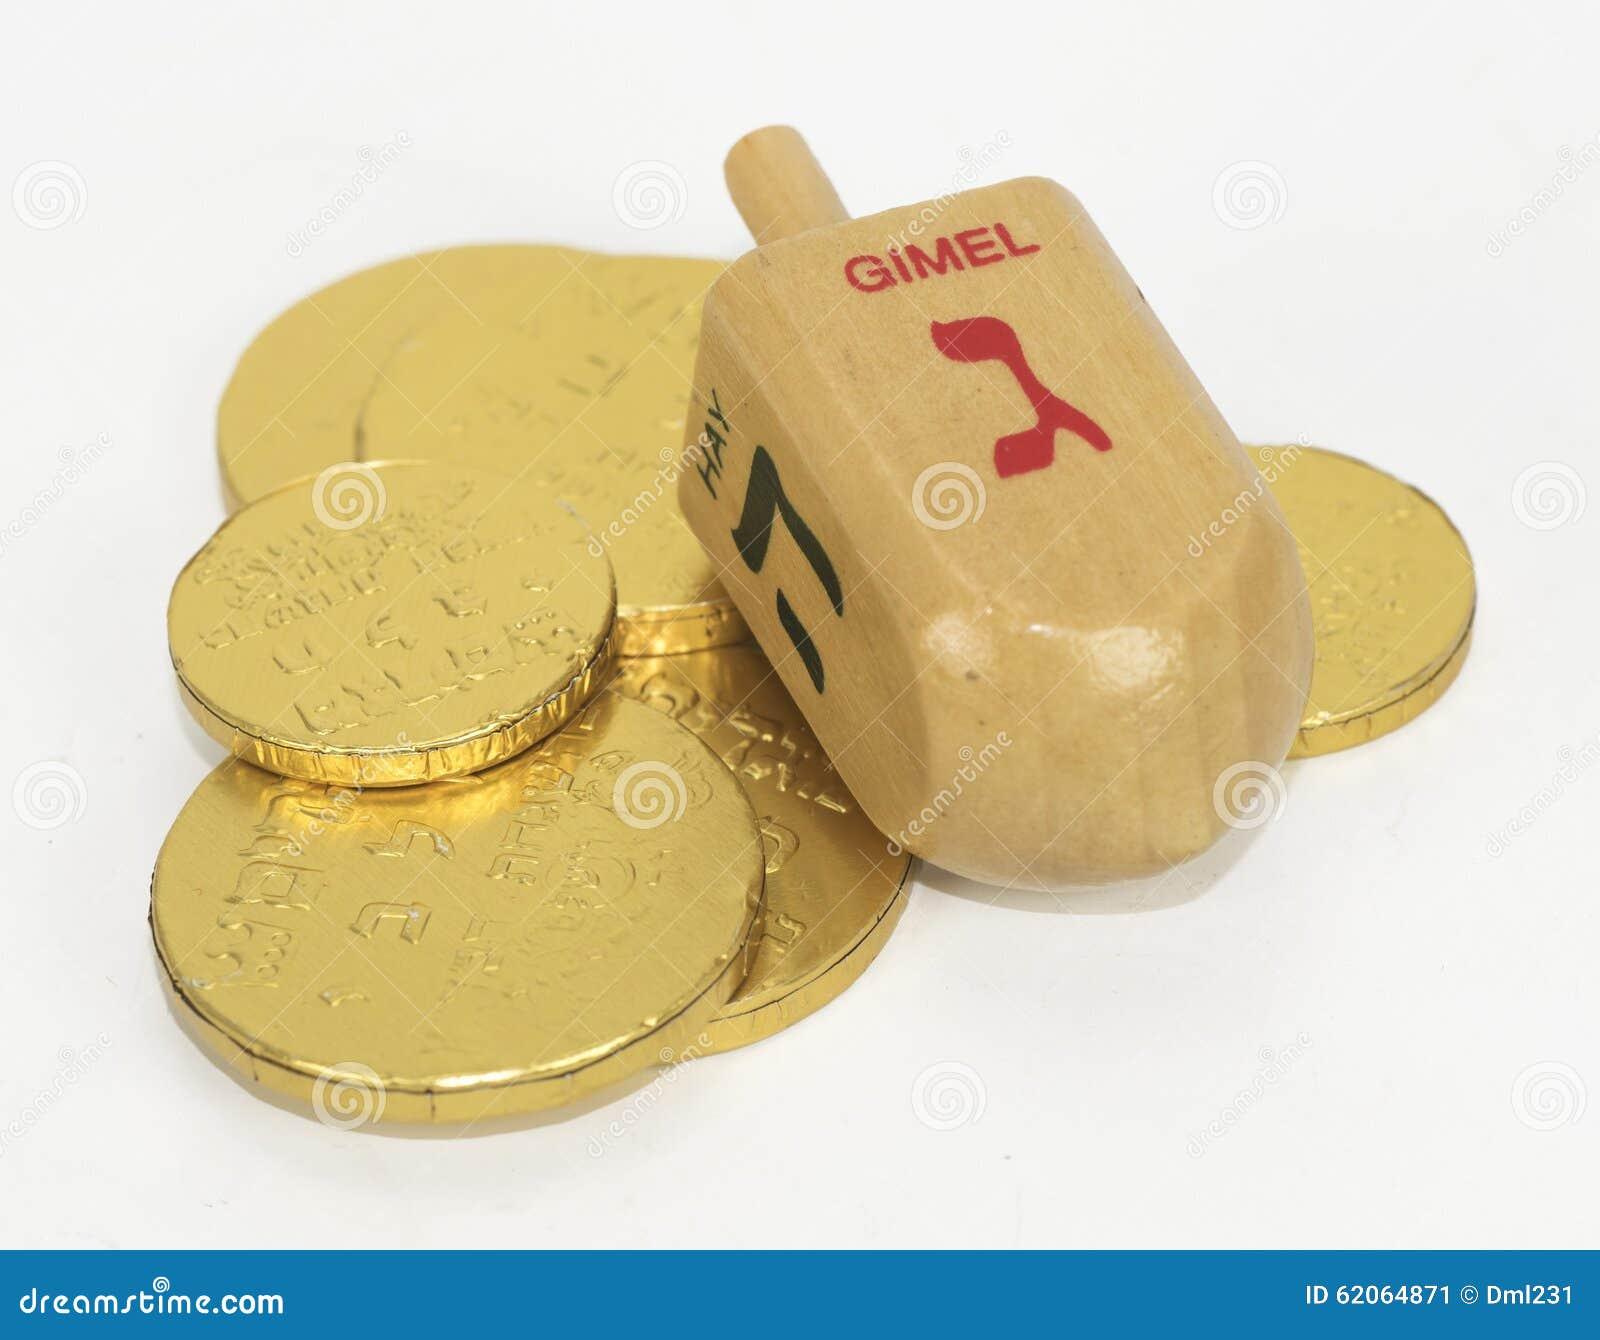 Chanukah Dreidel And Chocolate Coins Stock Photo - Image: 62064871